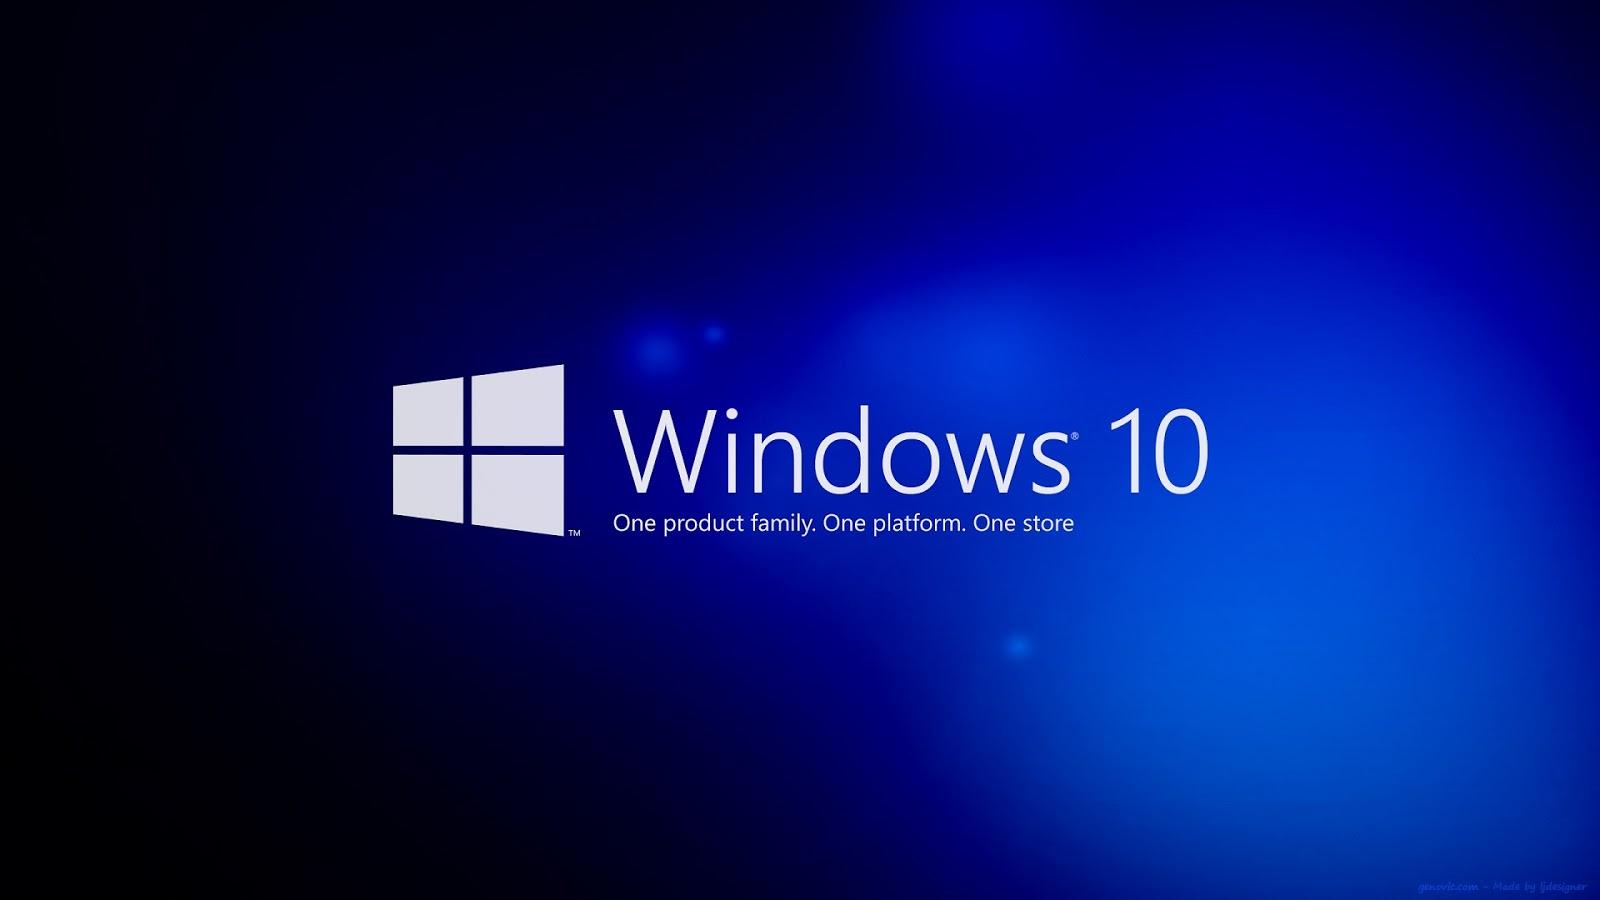 Wallpaper Bergerak Untuk Pc Windows 8